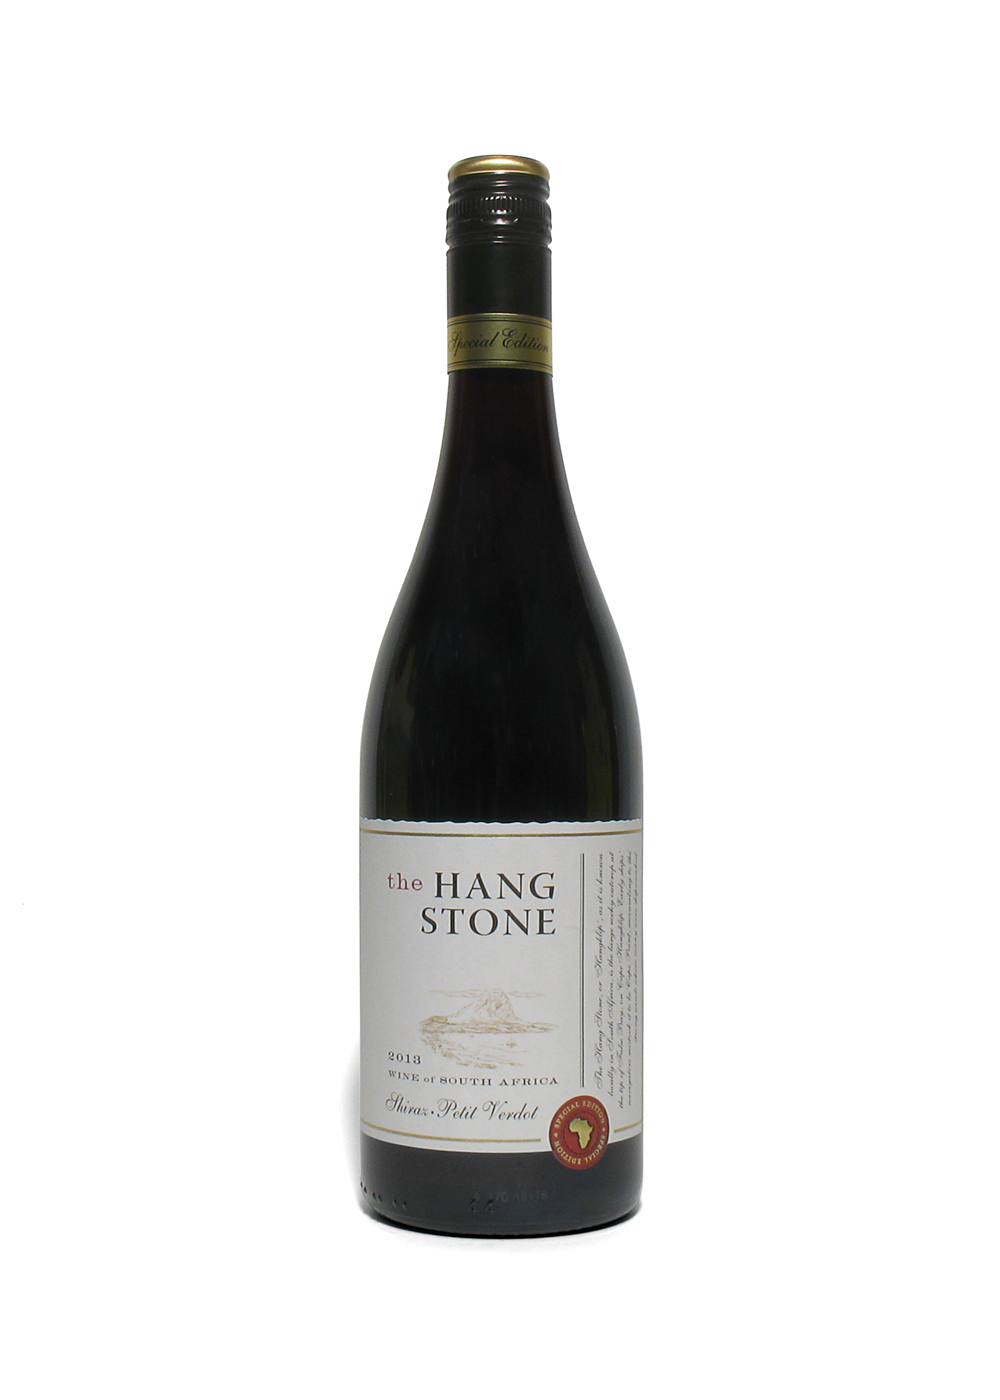 the Hang Stone